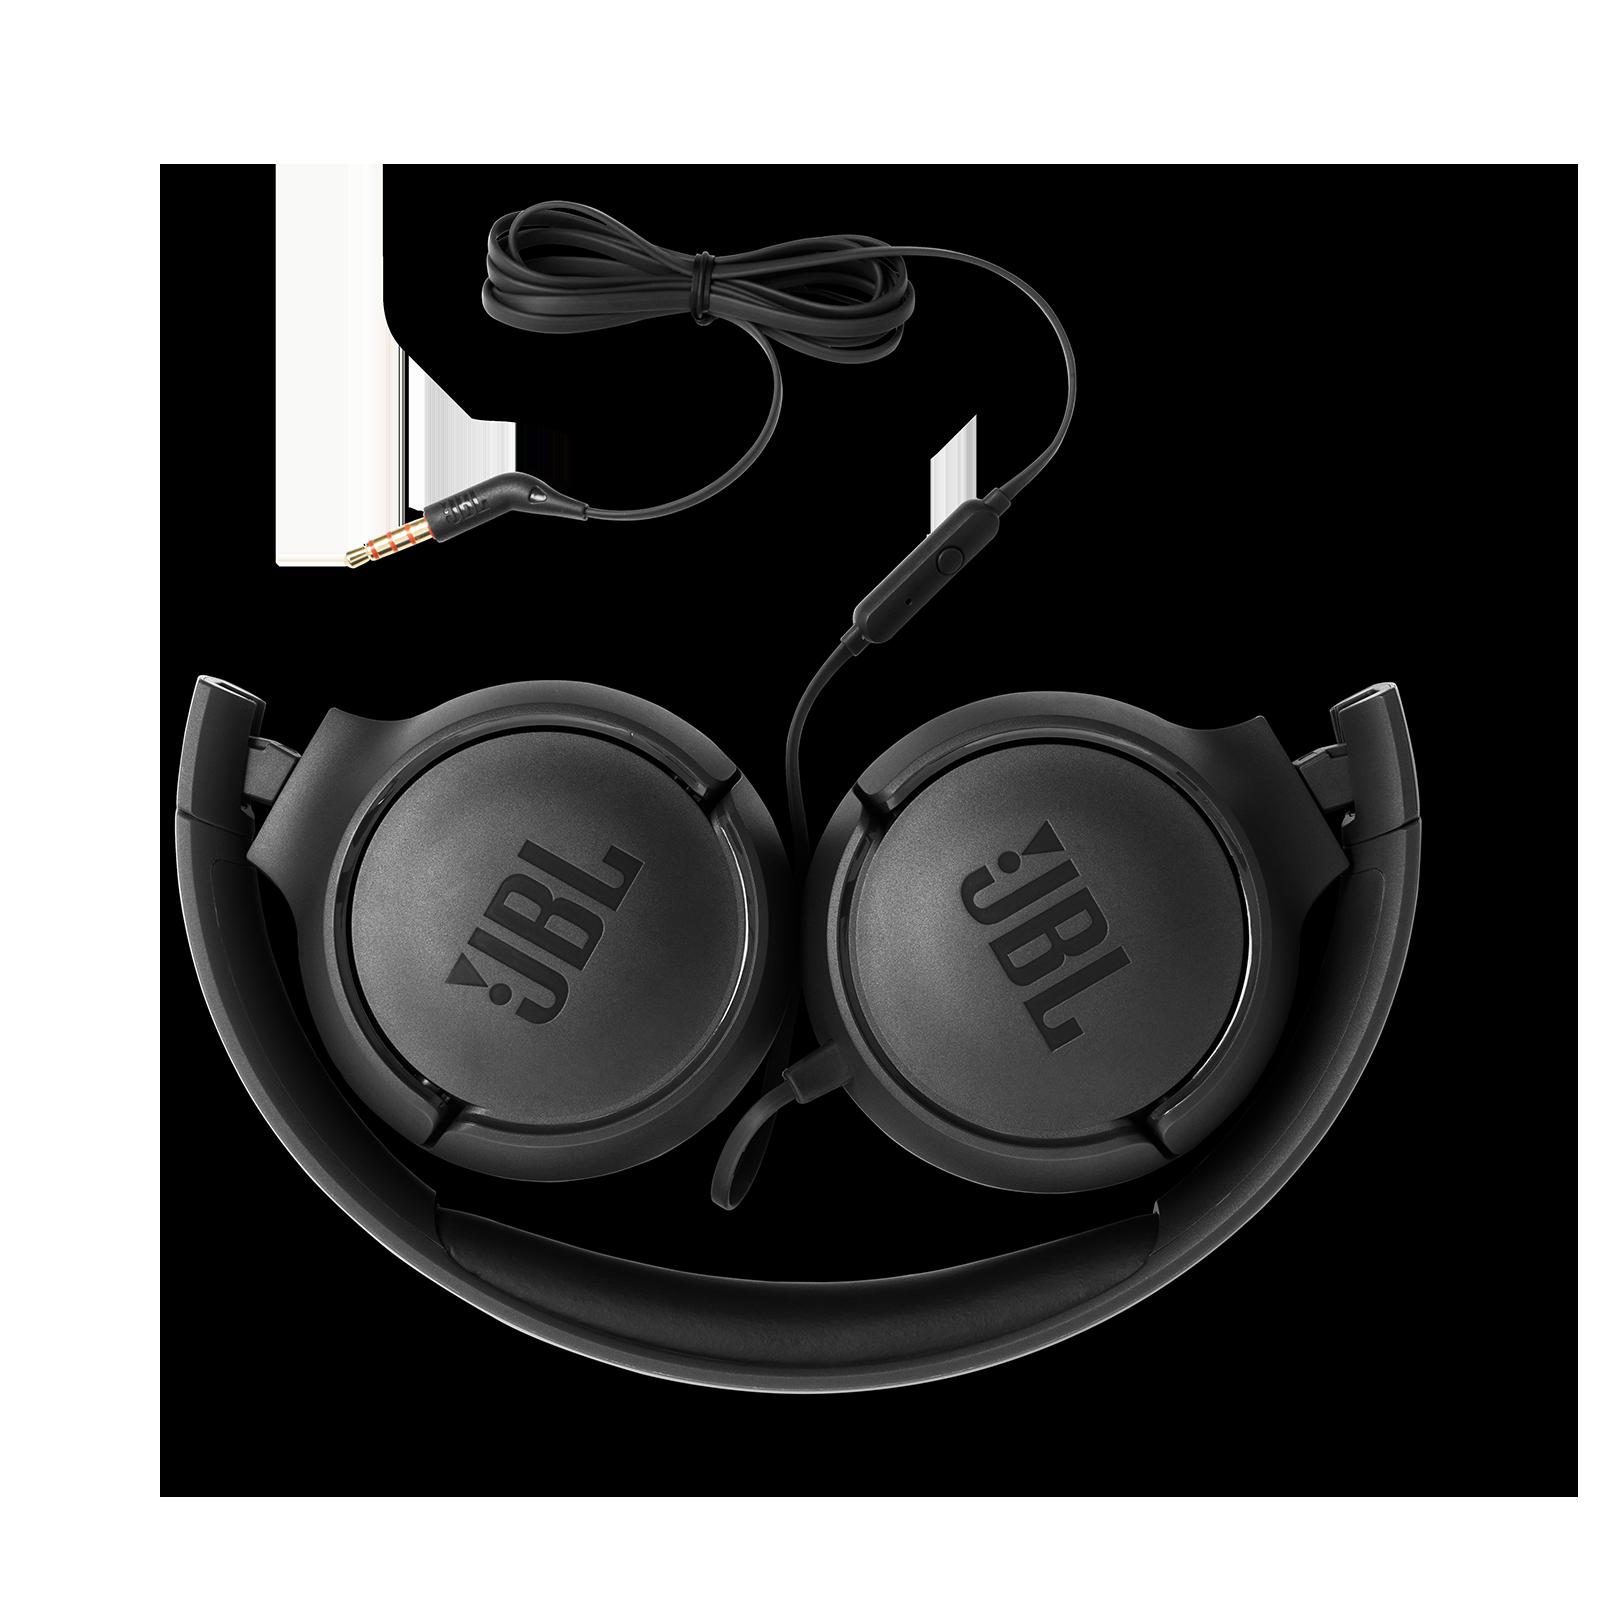 JBL TUNE 500 - Black - Wired on-ear headphones - Detailshot 1